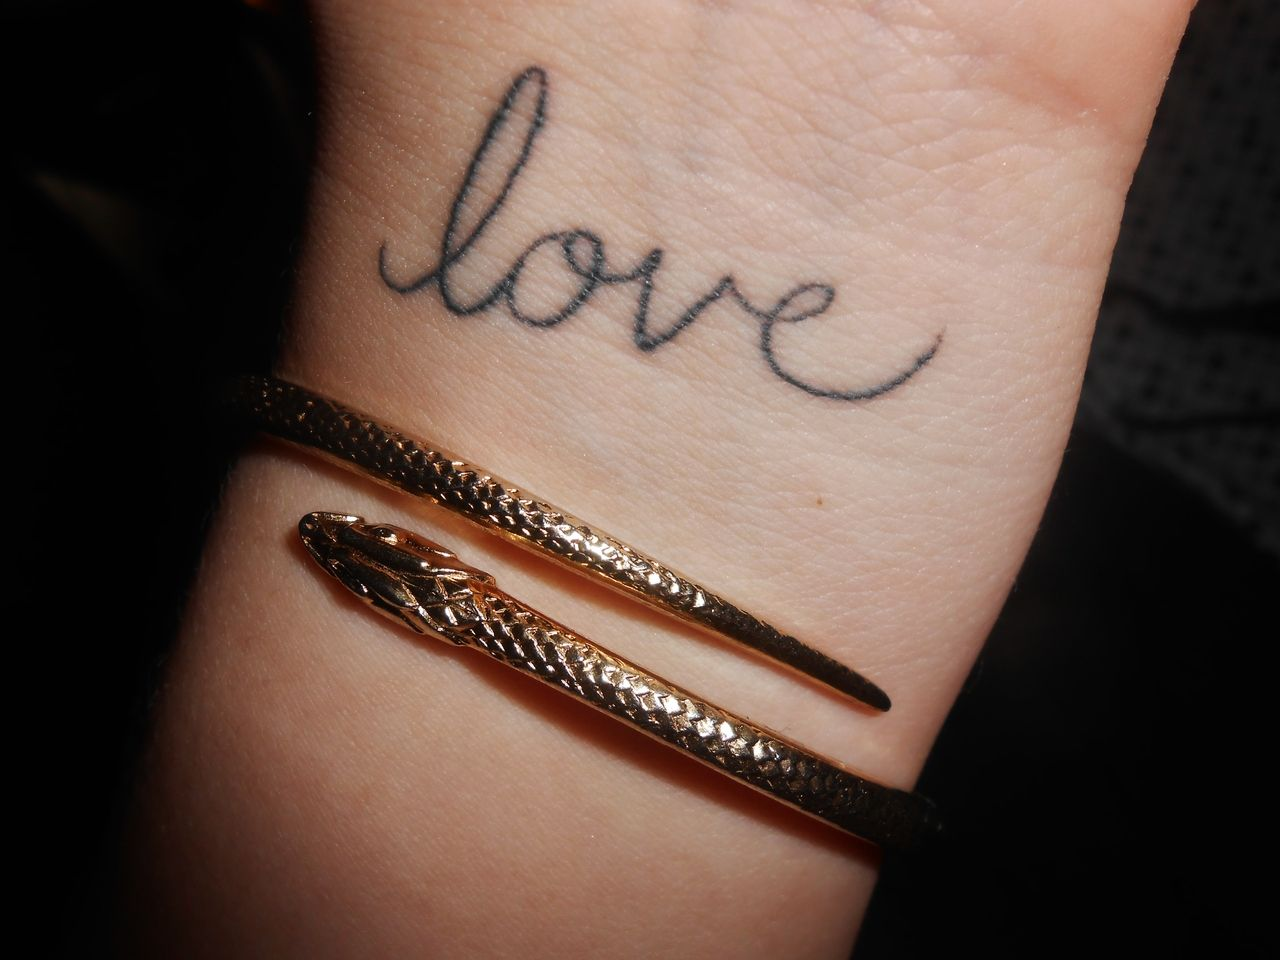 Similar to my own tattoo idea tattoo elements pinterest snake